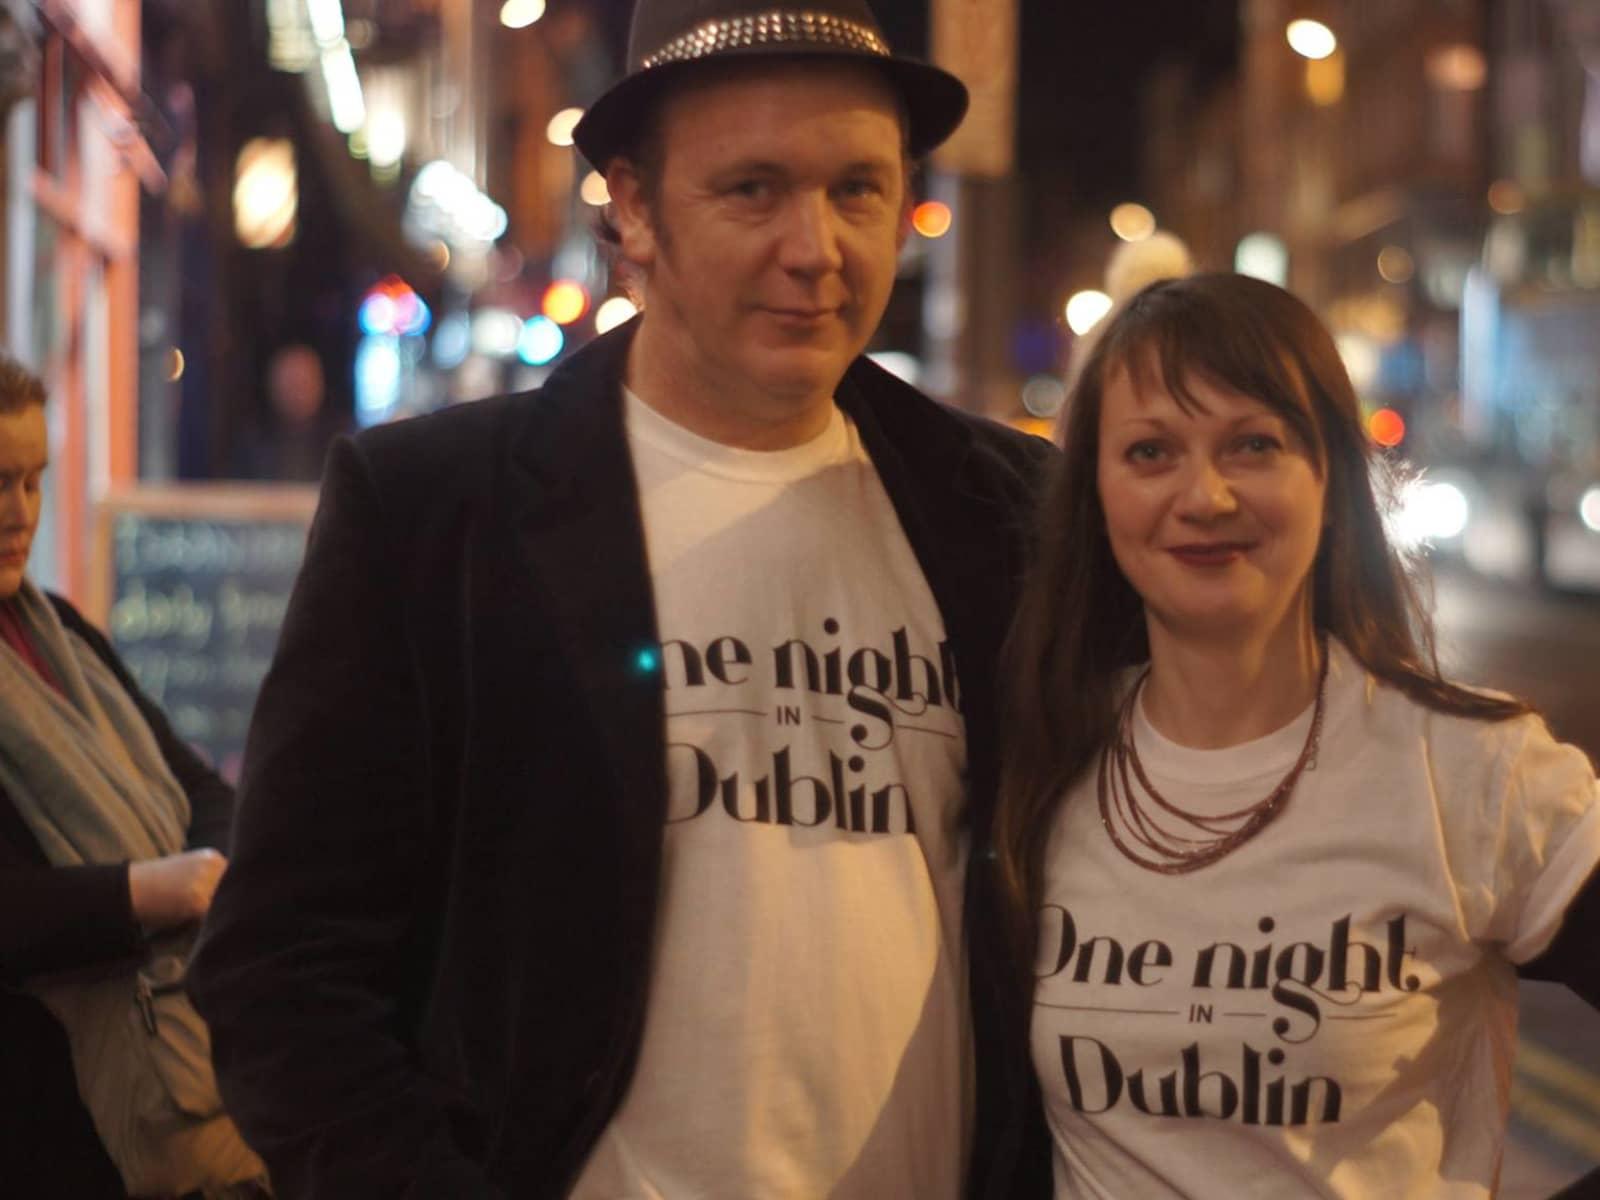 Alexandra & Robert from Dublin, Ireland